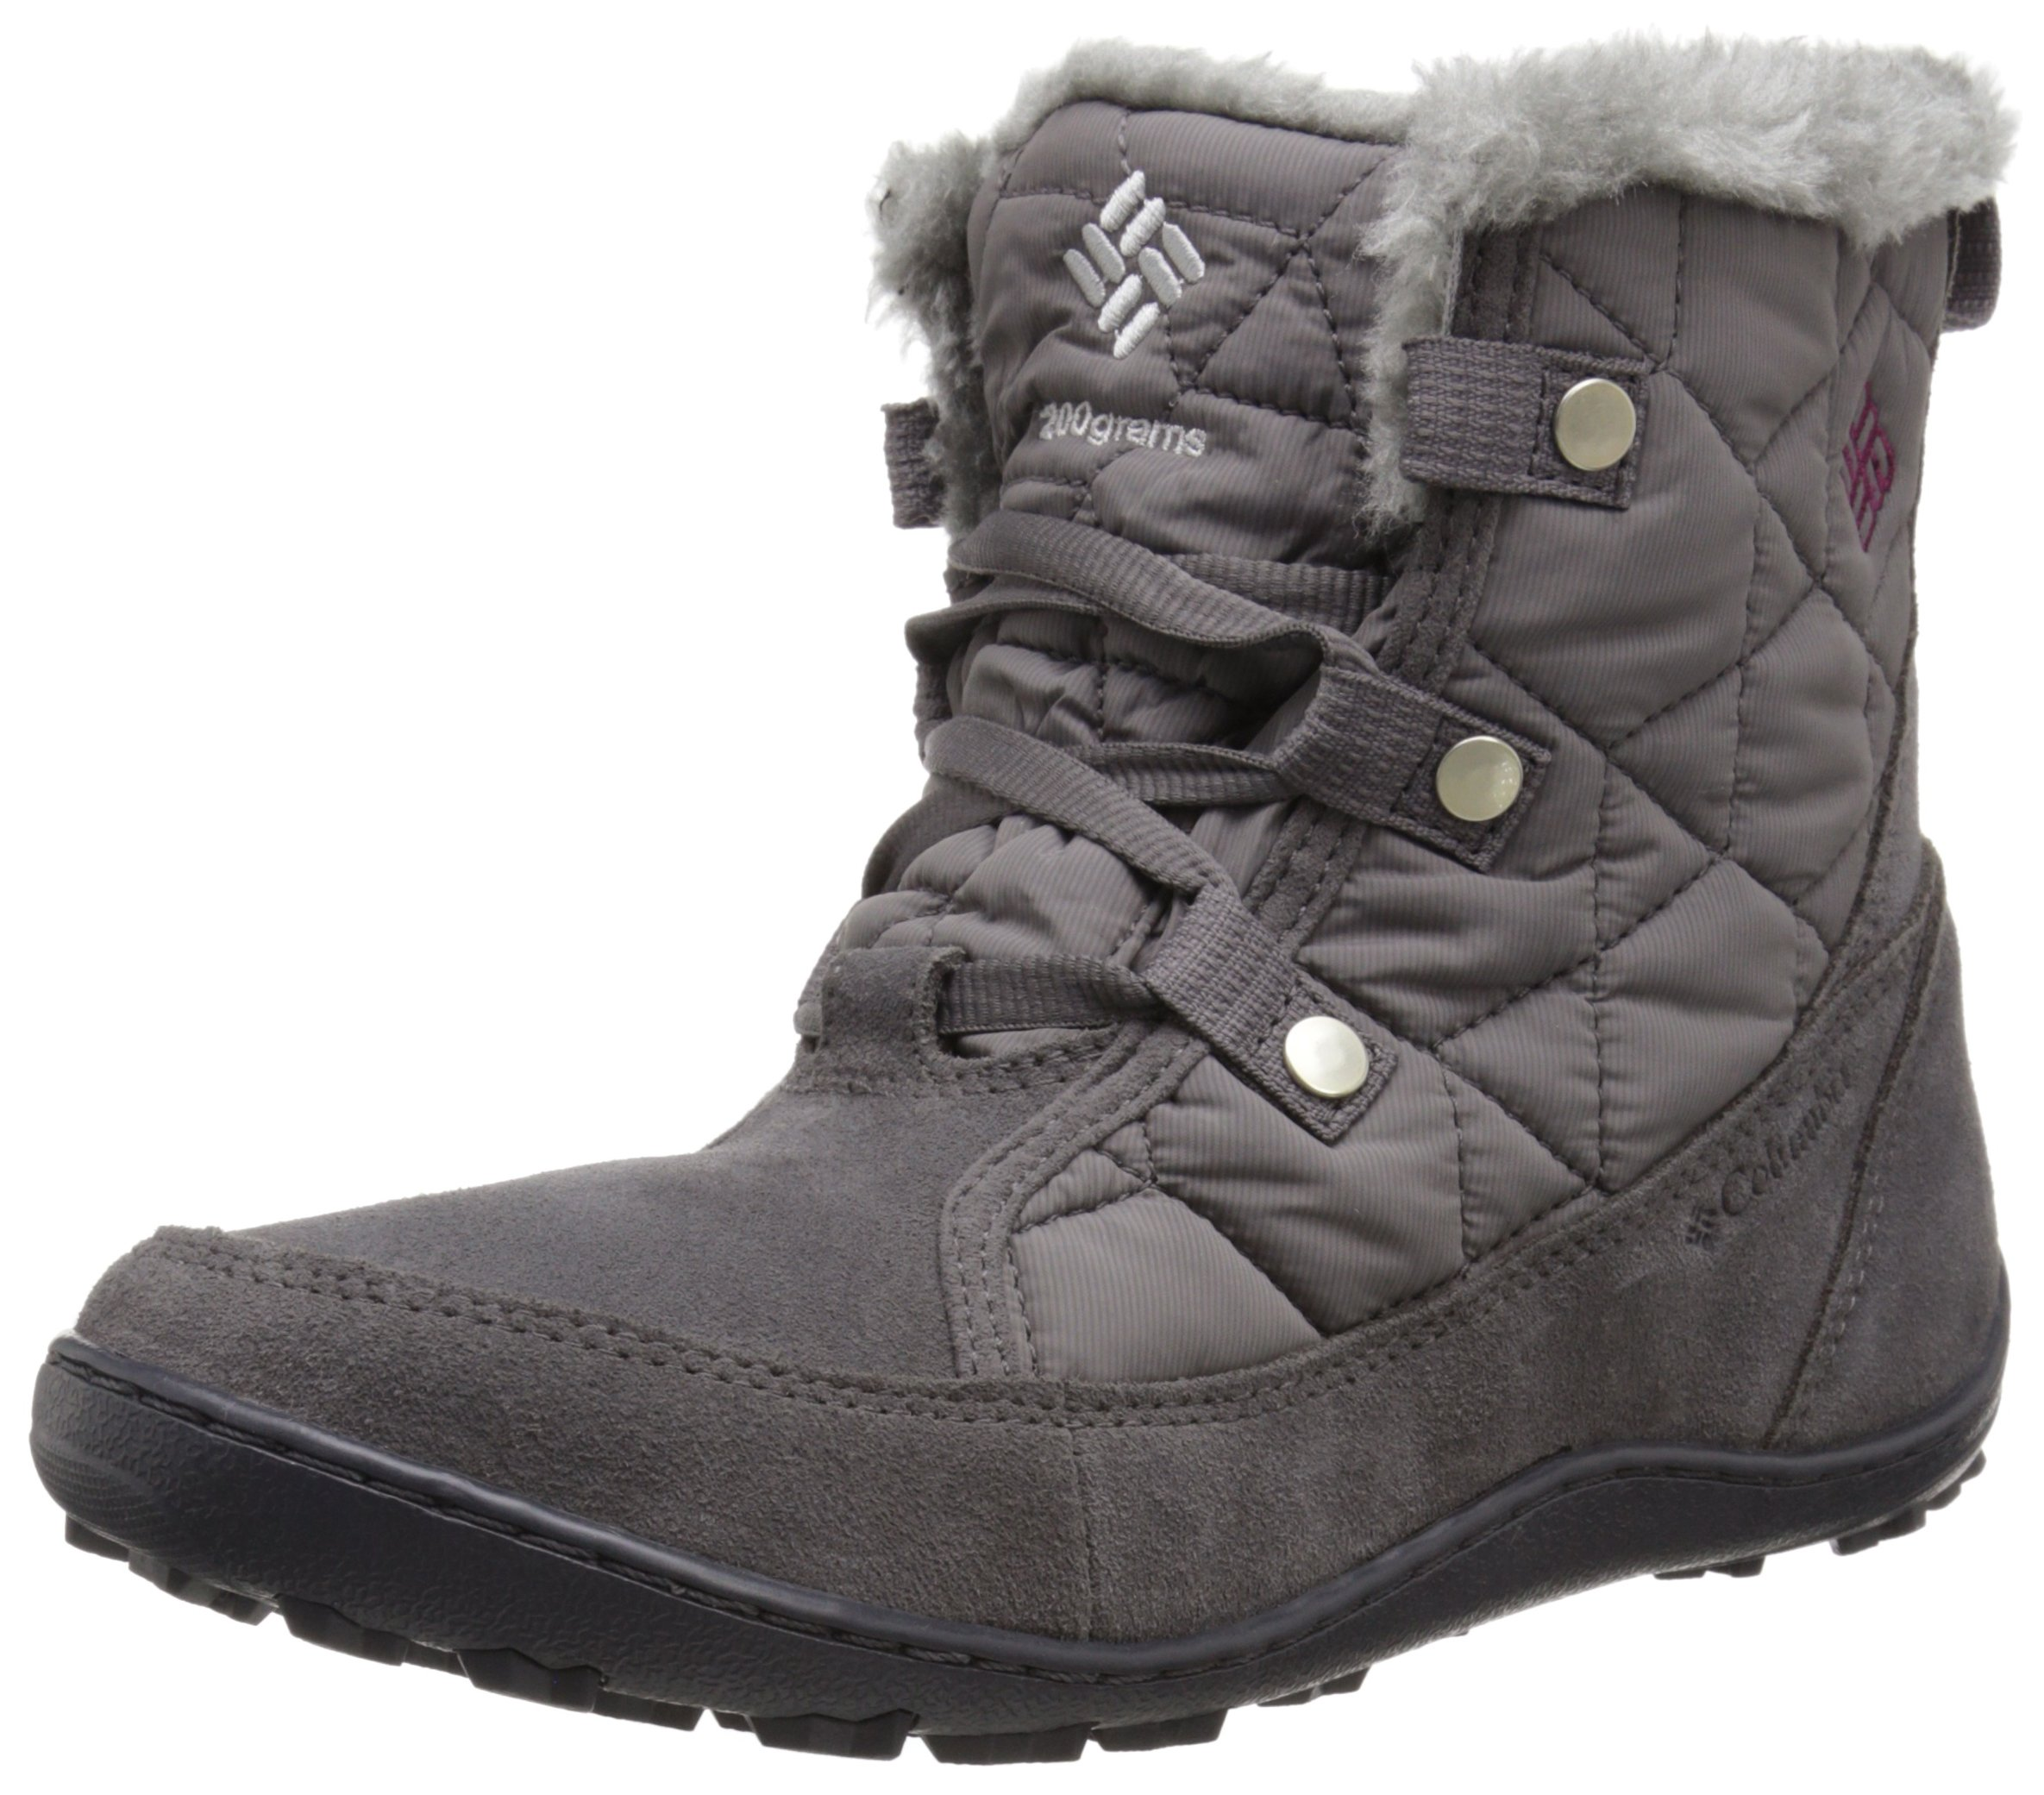 Columbia Women's Minx Shorty Omni-Heat Snow Boot, Shale, Dark Raspberry, 8.5 B US